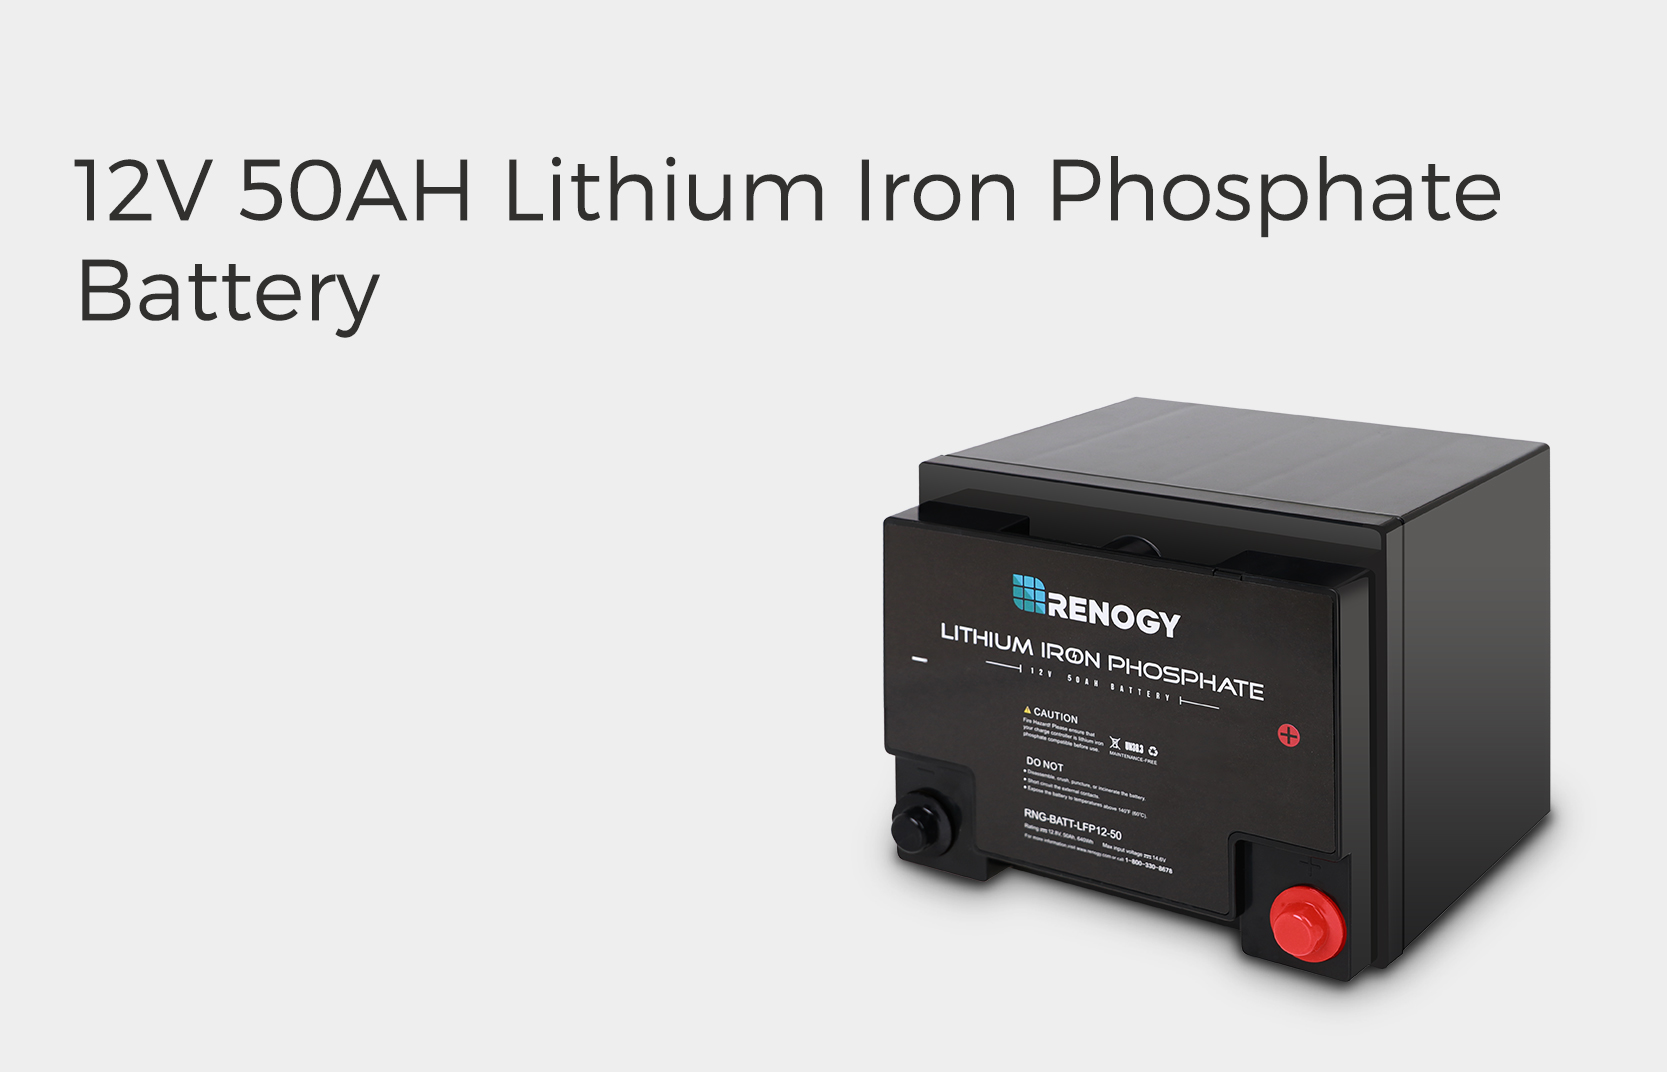 12V 50Ah Lithium Iron Phosphate Battery